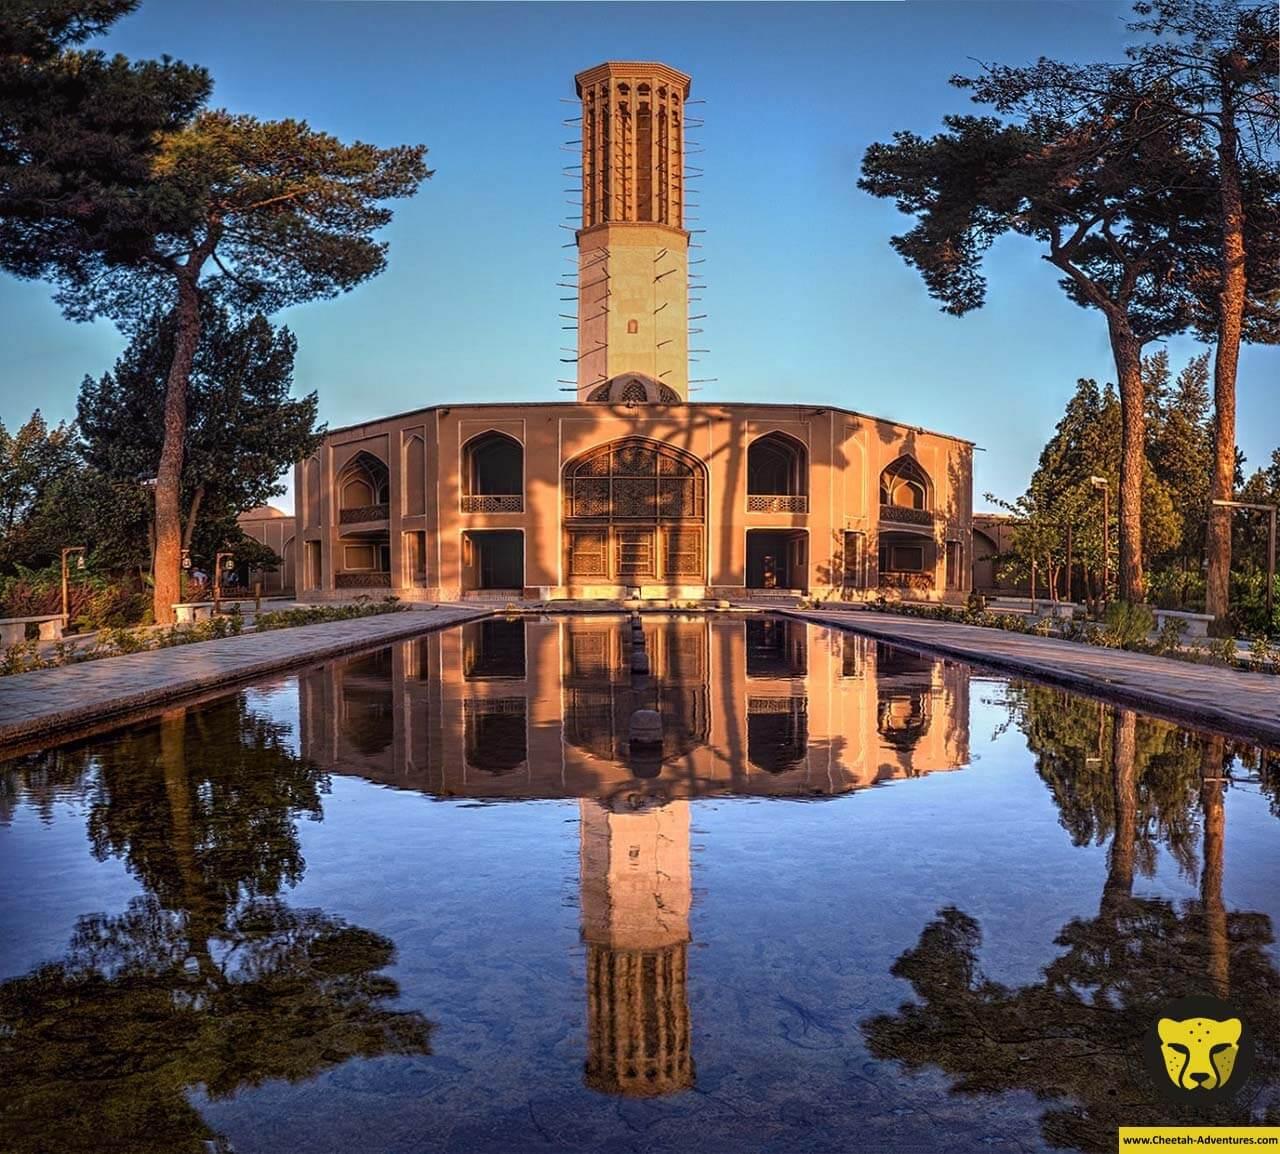 Dowlat Abad Garden Dolat Abad Garden yazd travel guide iran tour cheetah adventures